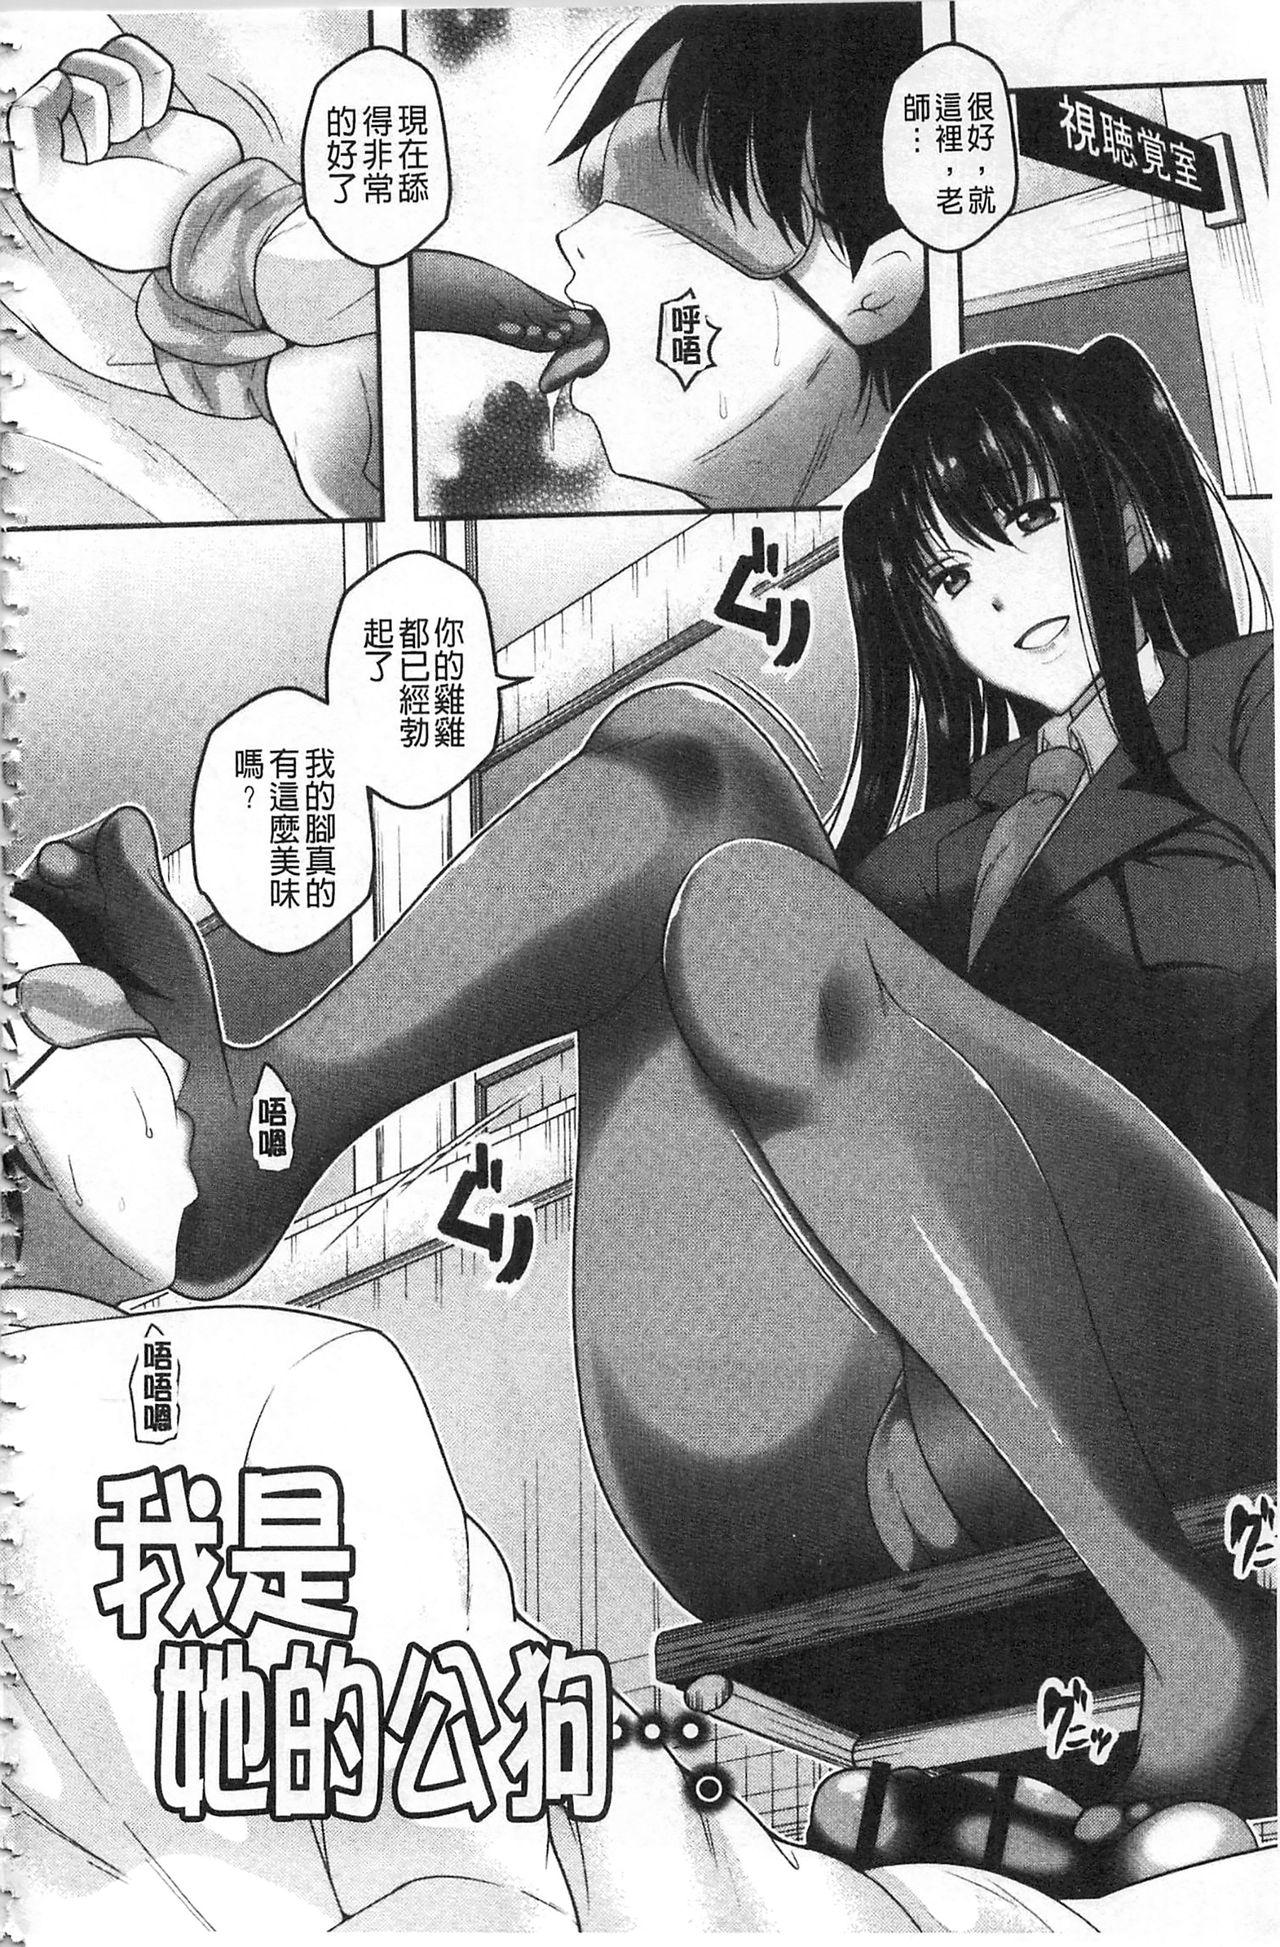 Kanjuku Otome no Odoshikata | 姦熟乙女的脅迫法 168